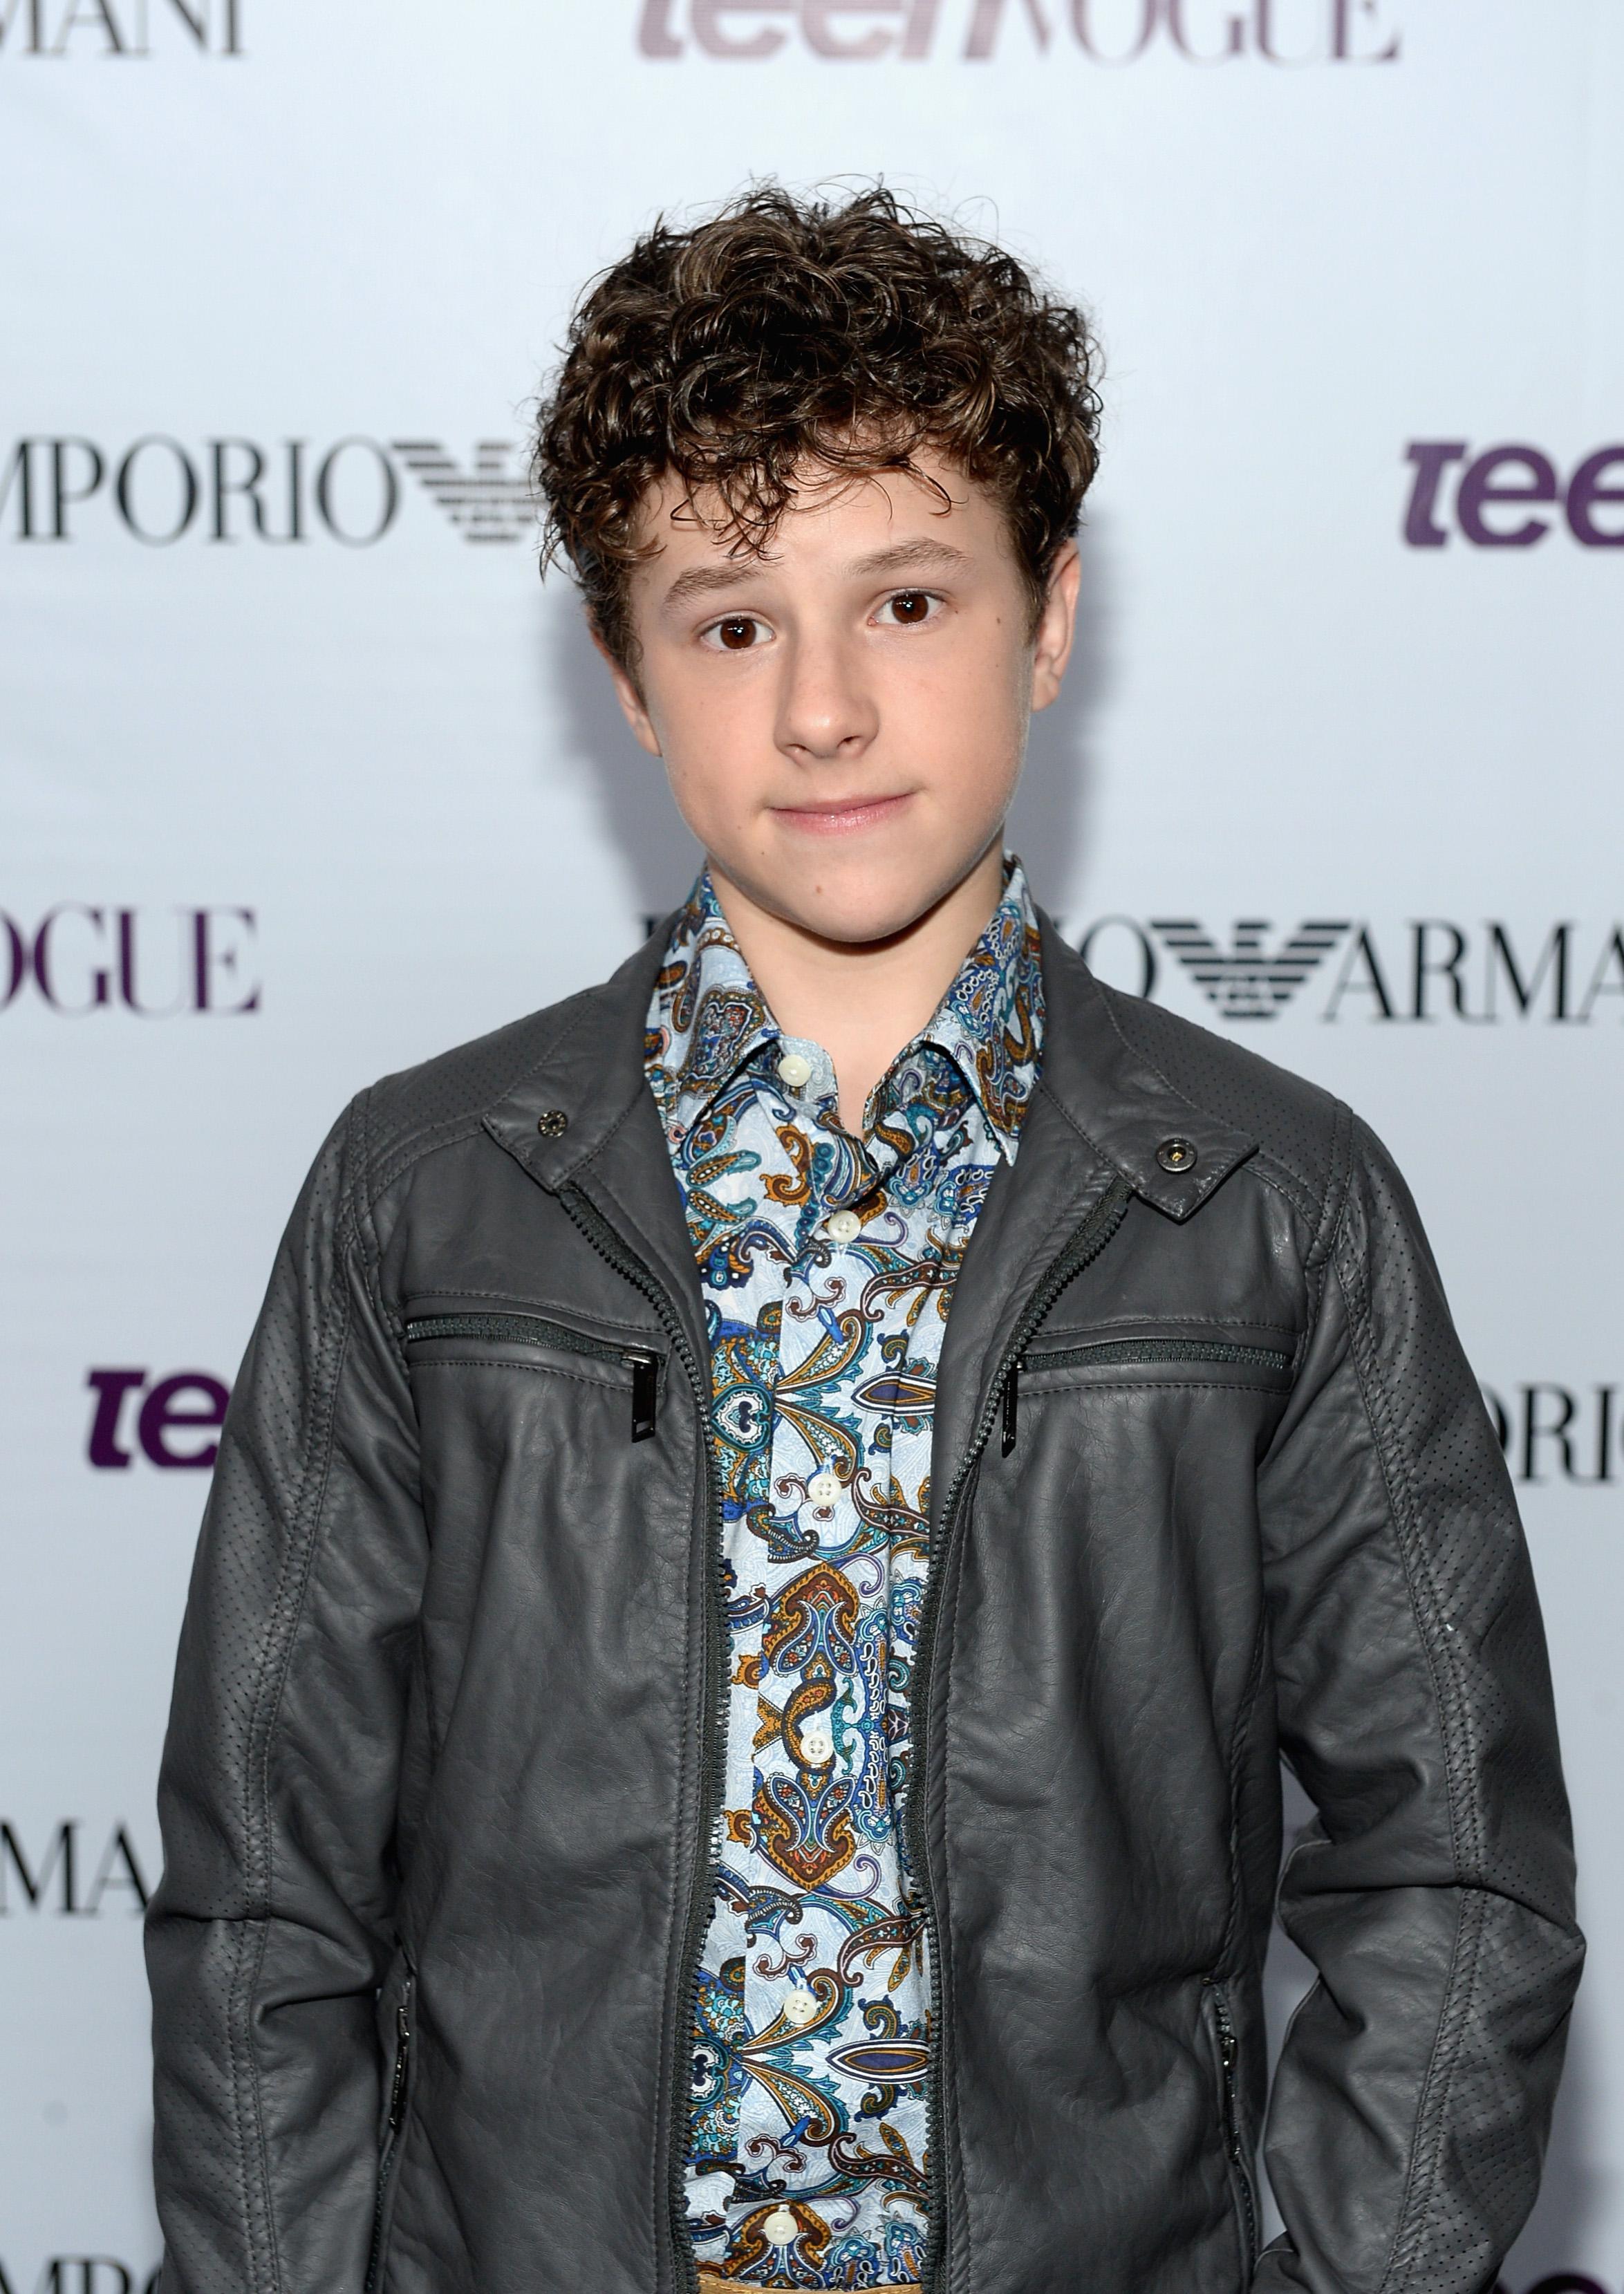 Michael Buckner/Getty Images for Teen Vogue